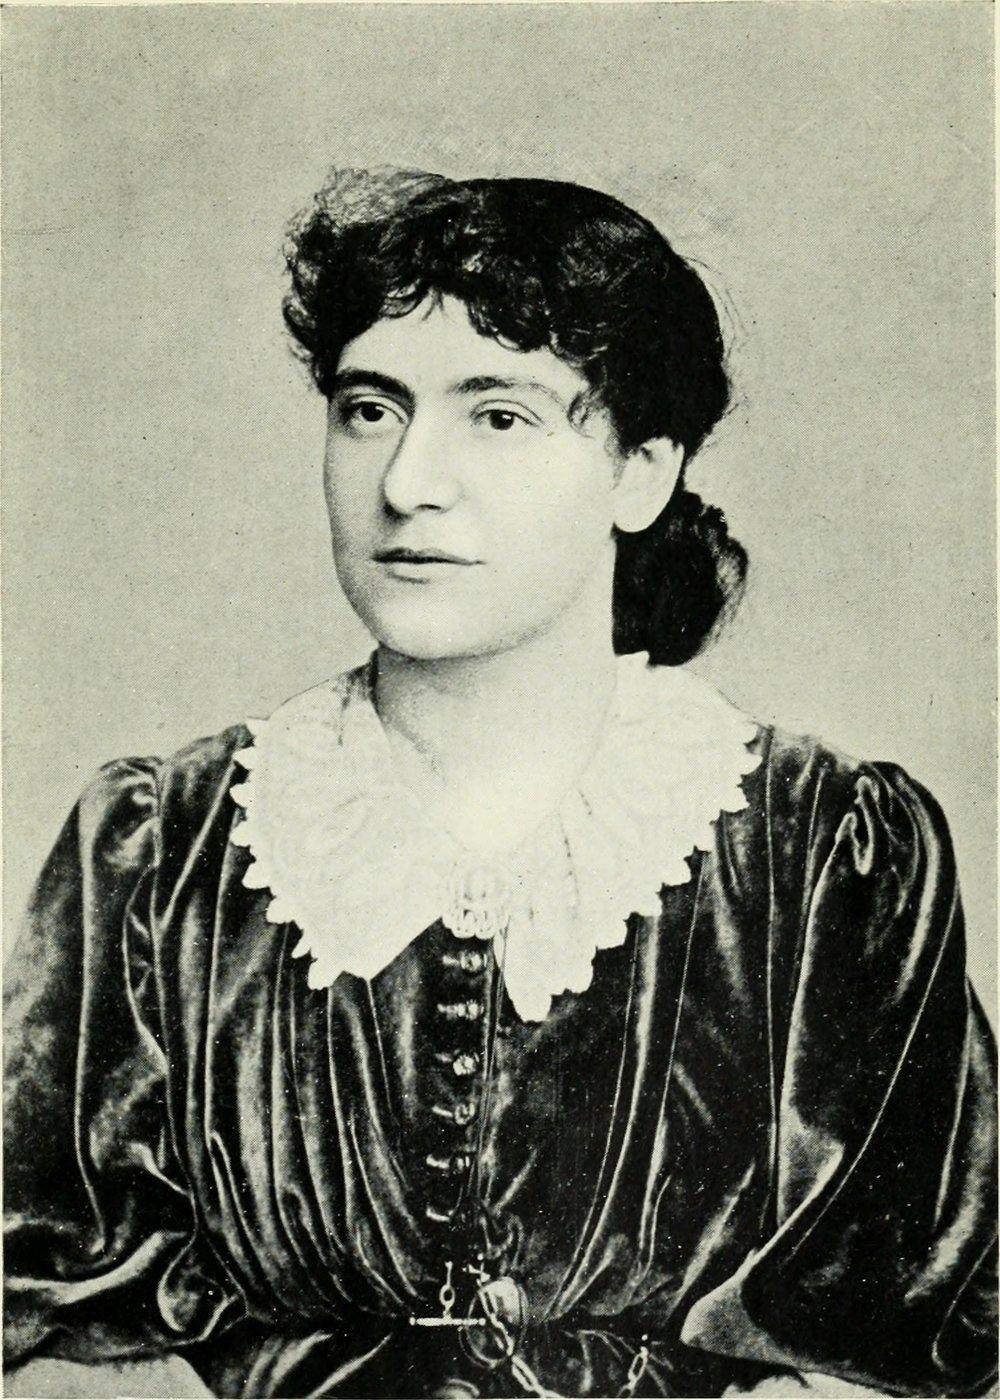 Mrs_Eleanor_Marx_Aveling,_daughter_of_Karl_Marx.jpg